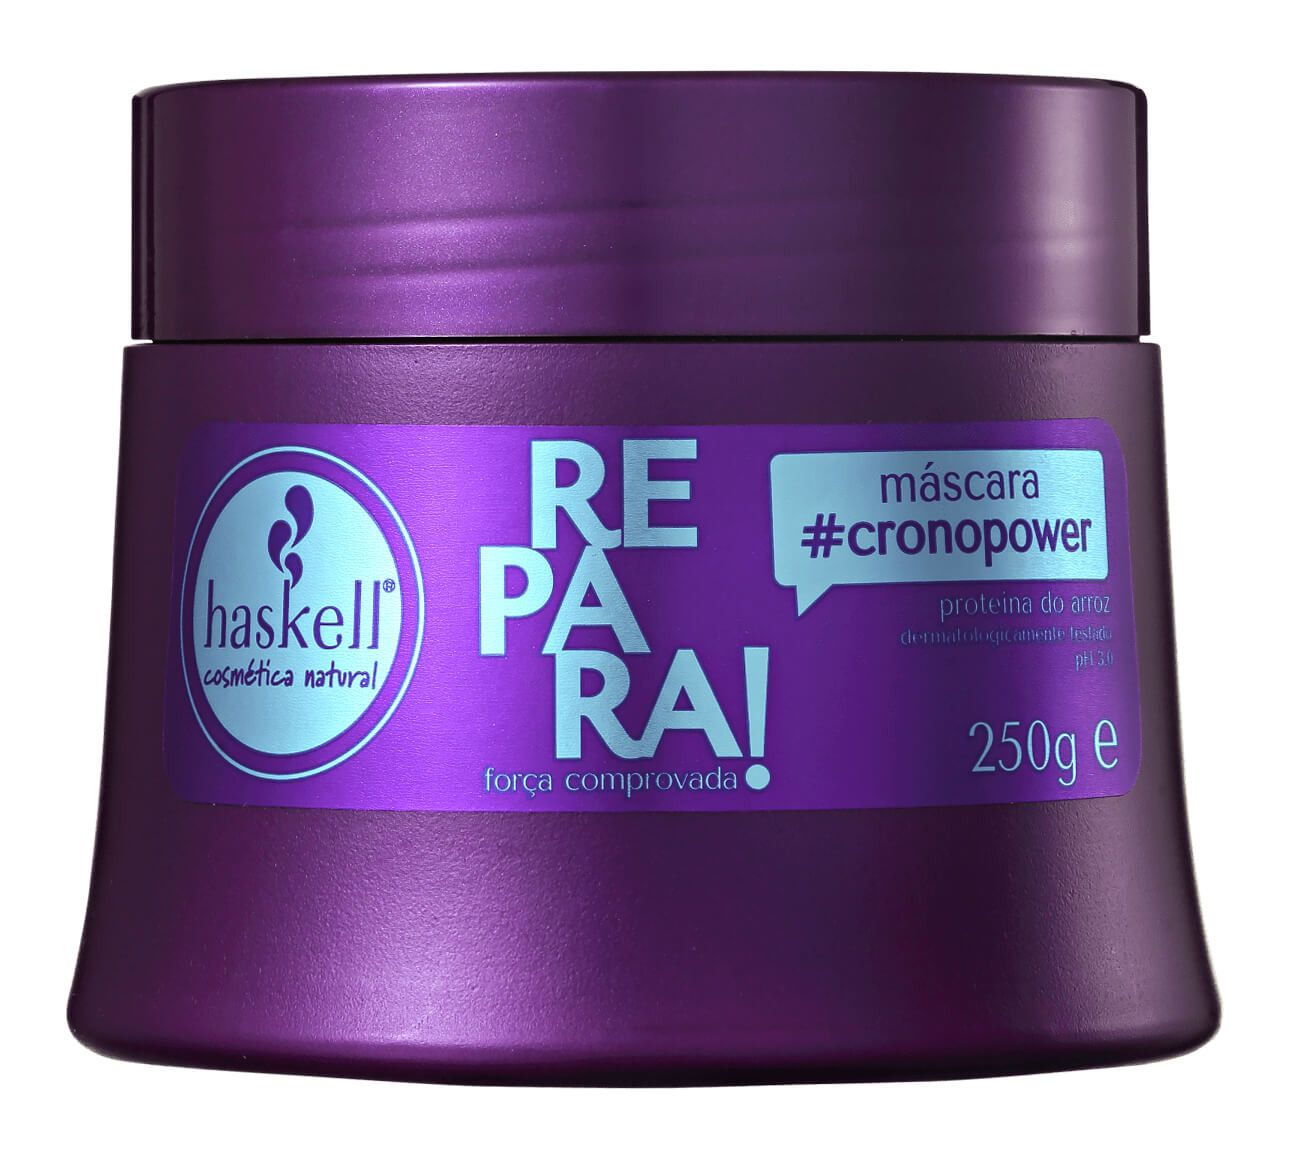 Mascara #Cronopower Repara! Haskell 250g  - LUISA PERFUMARIA E COSMETICOS